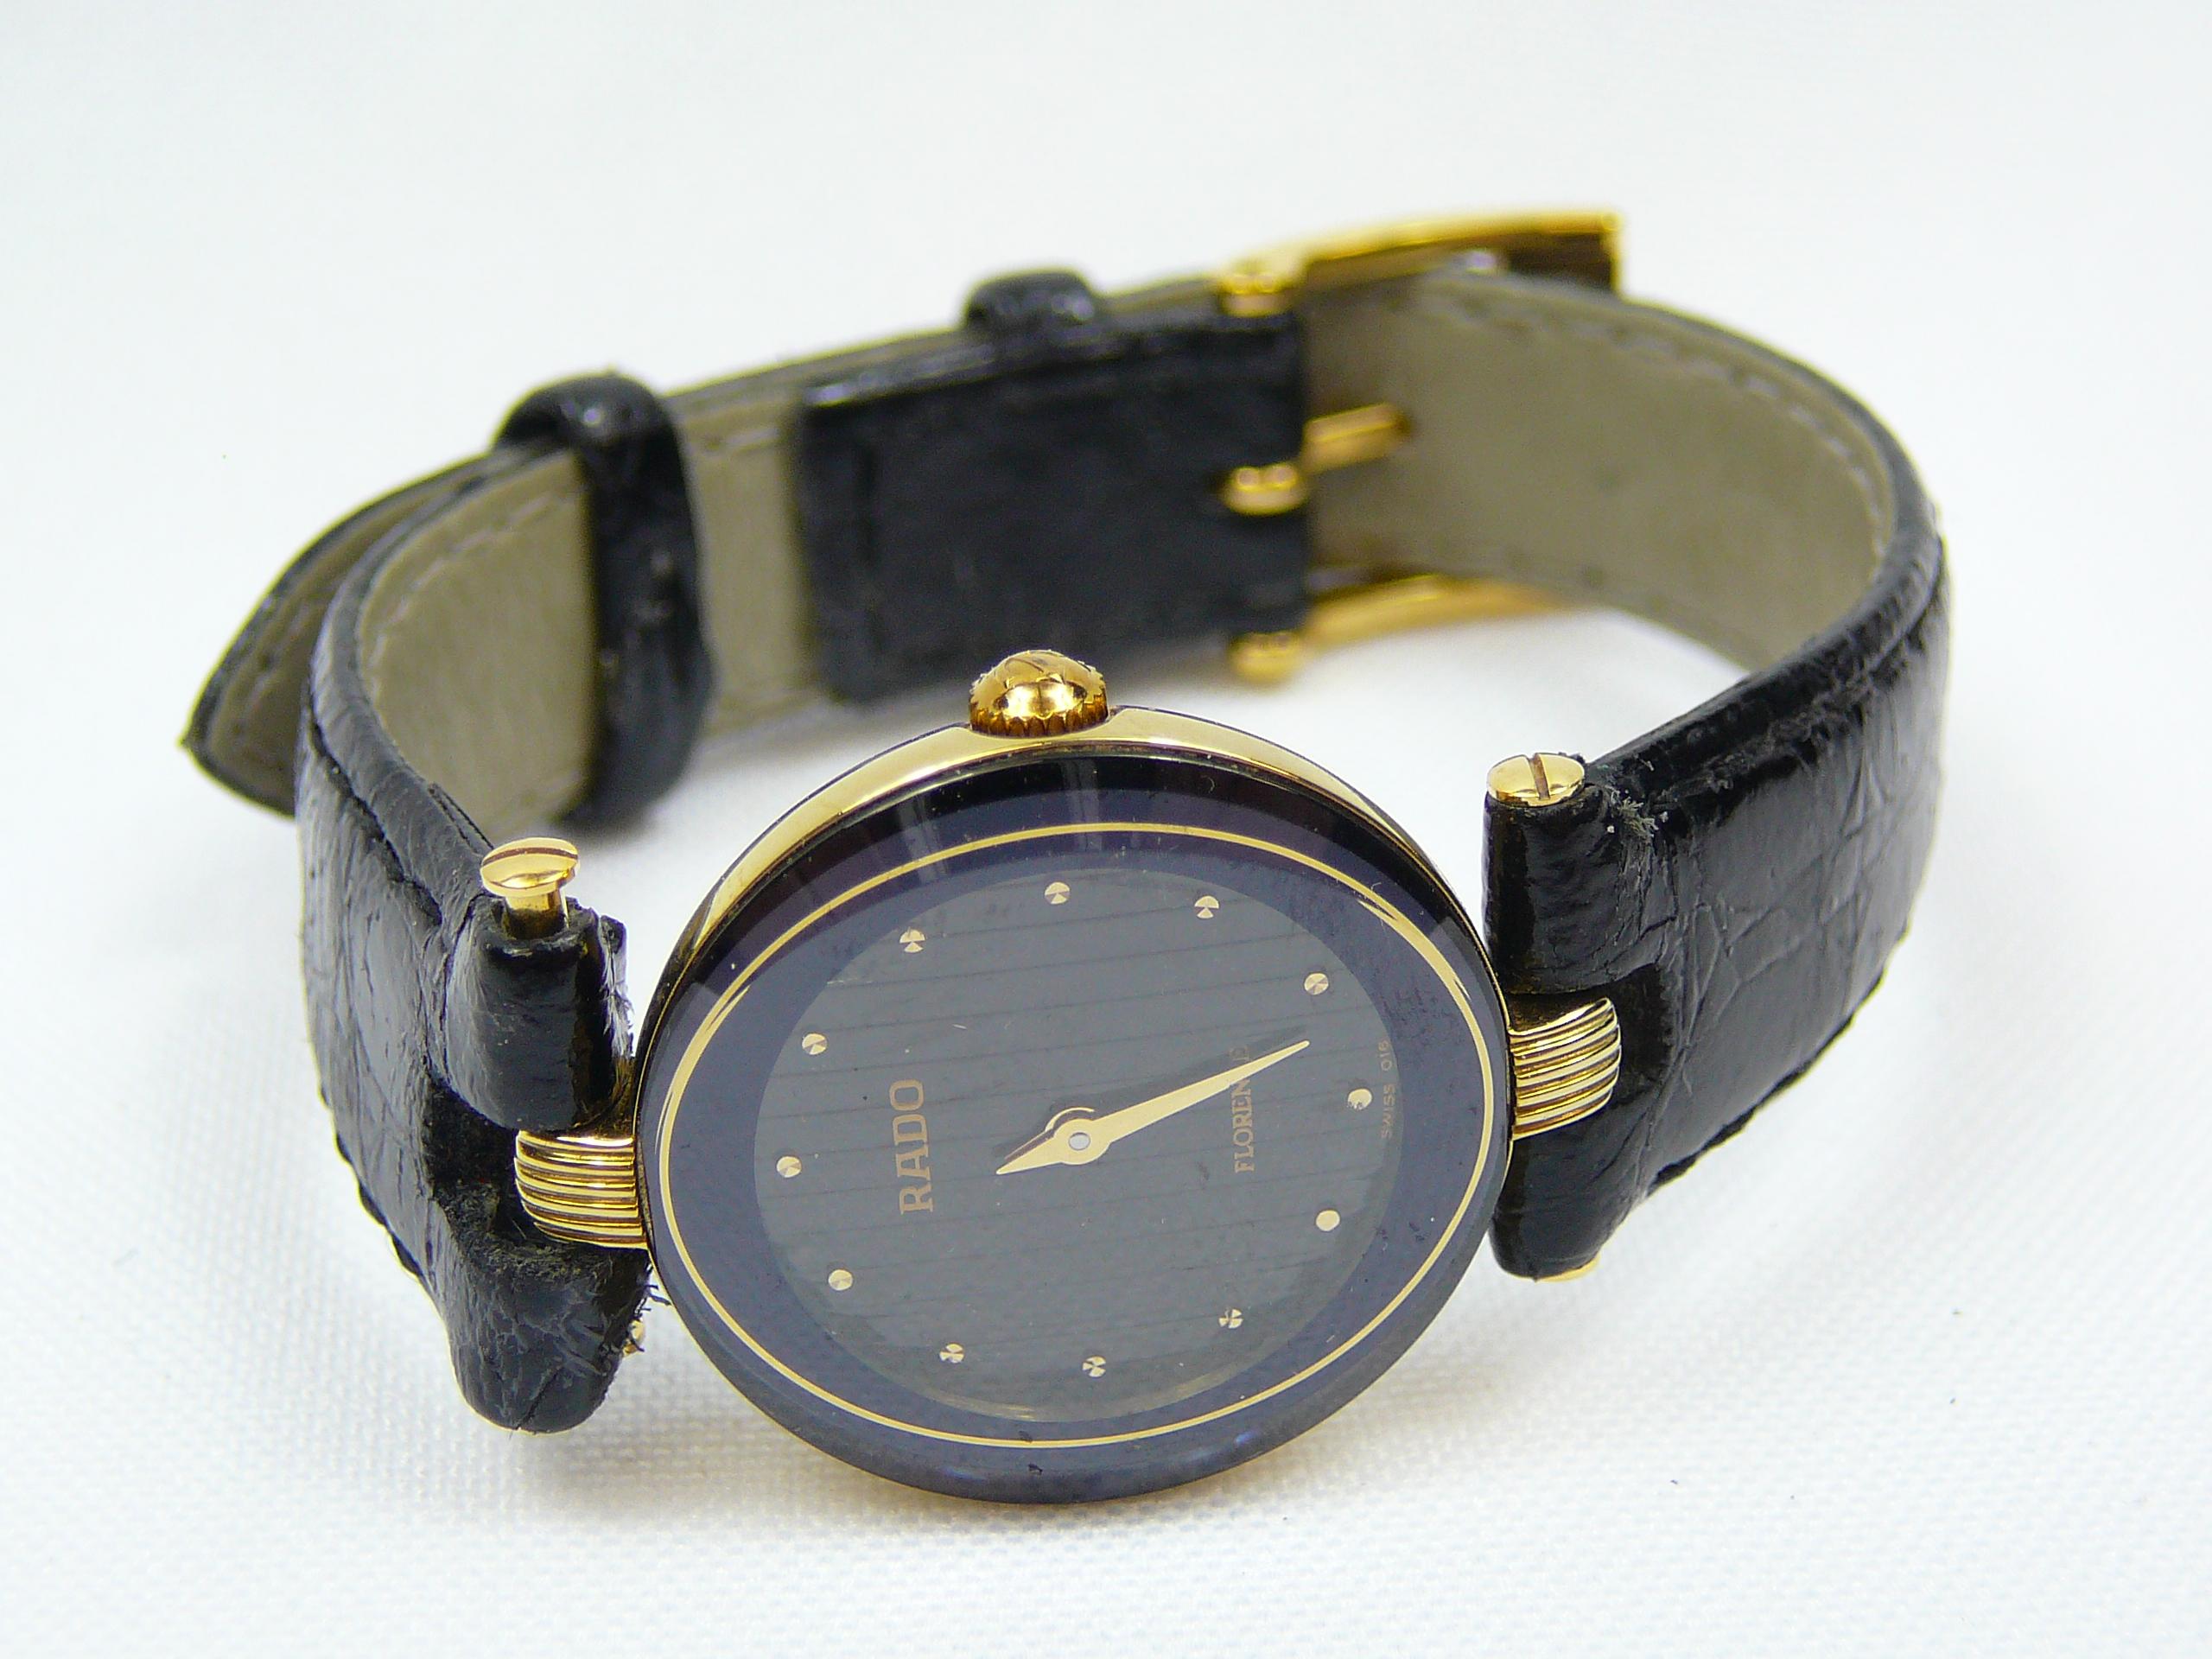 Ladies Rado Wrist Watch - Image 2 of 3